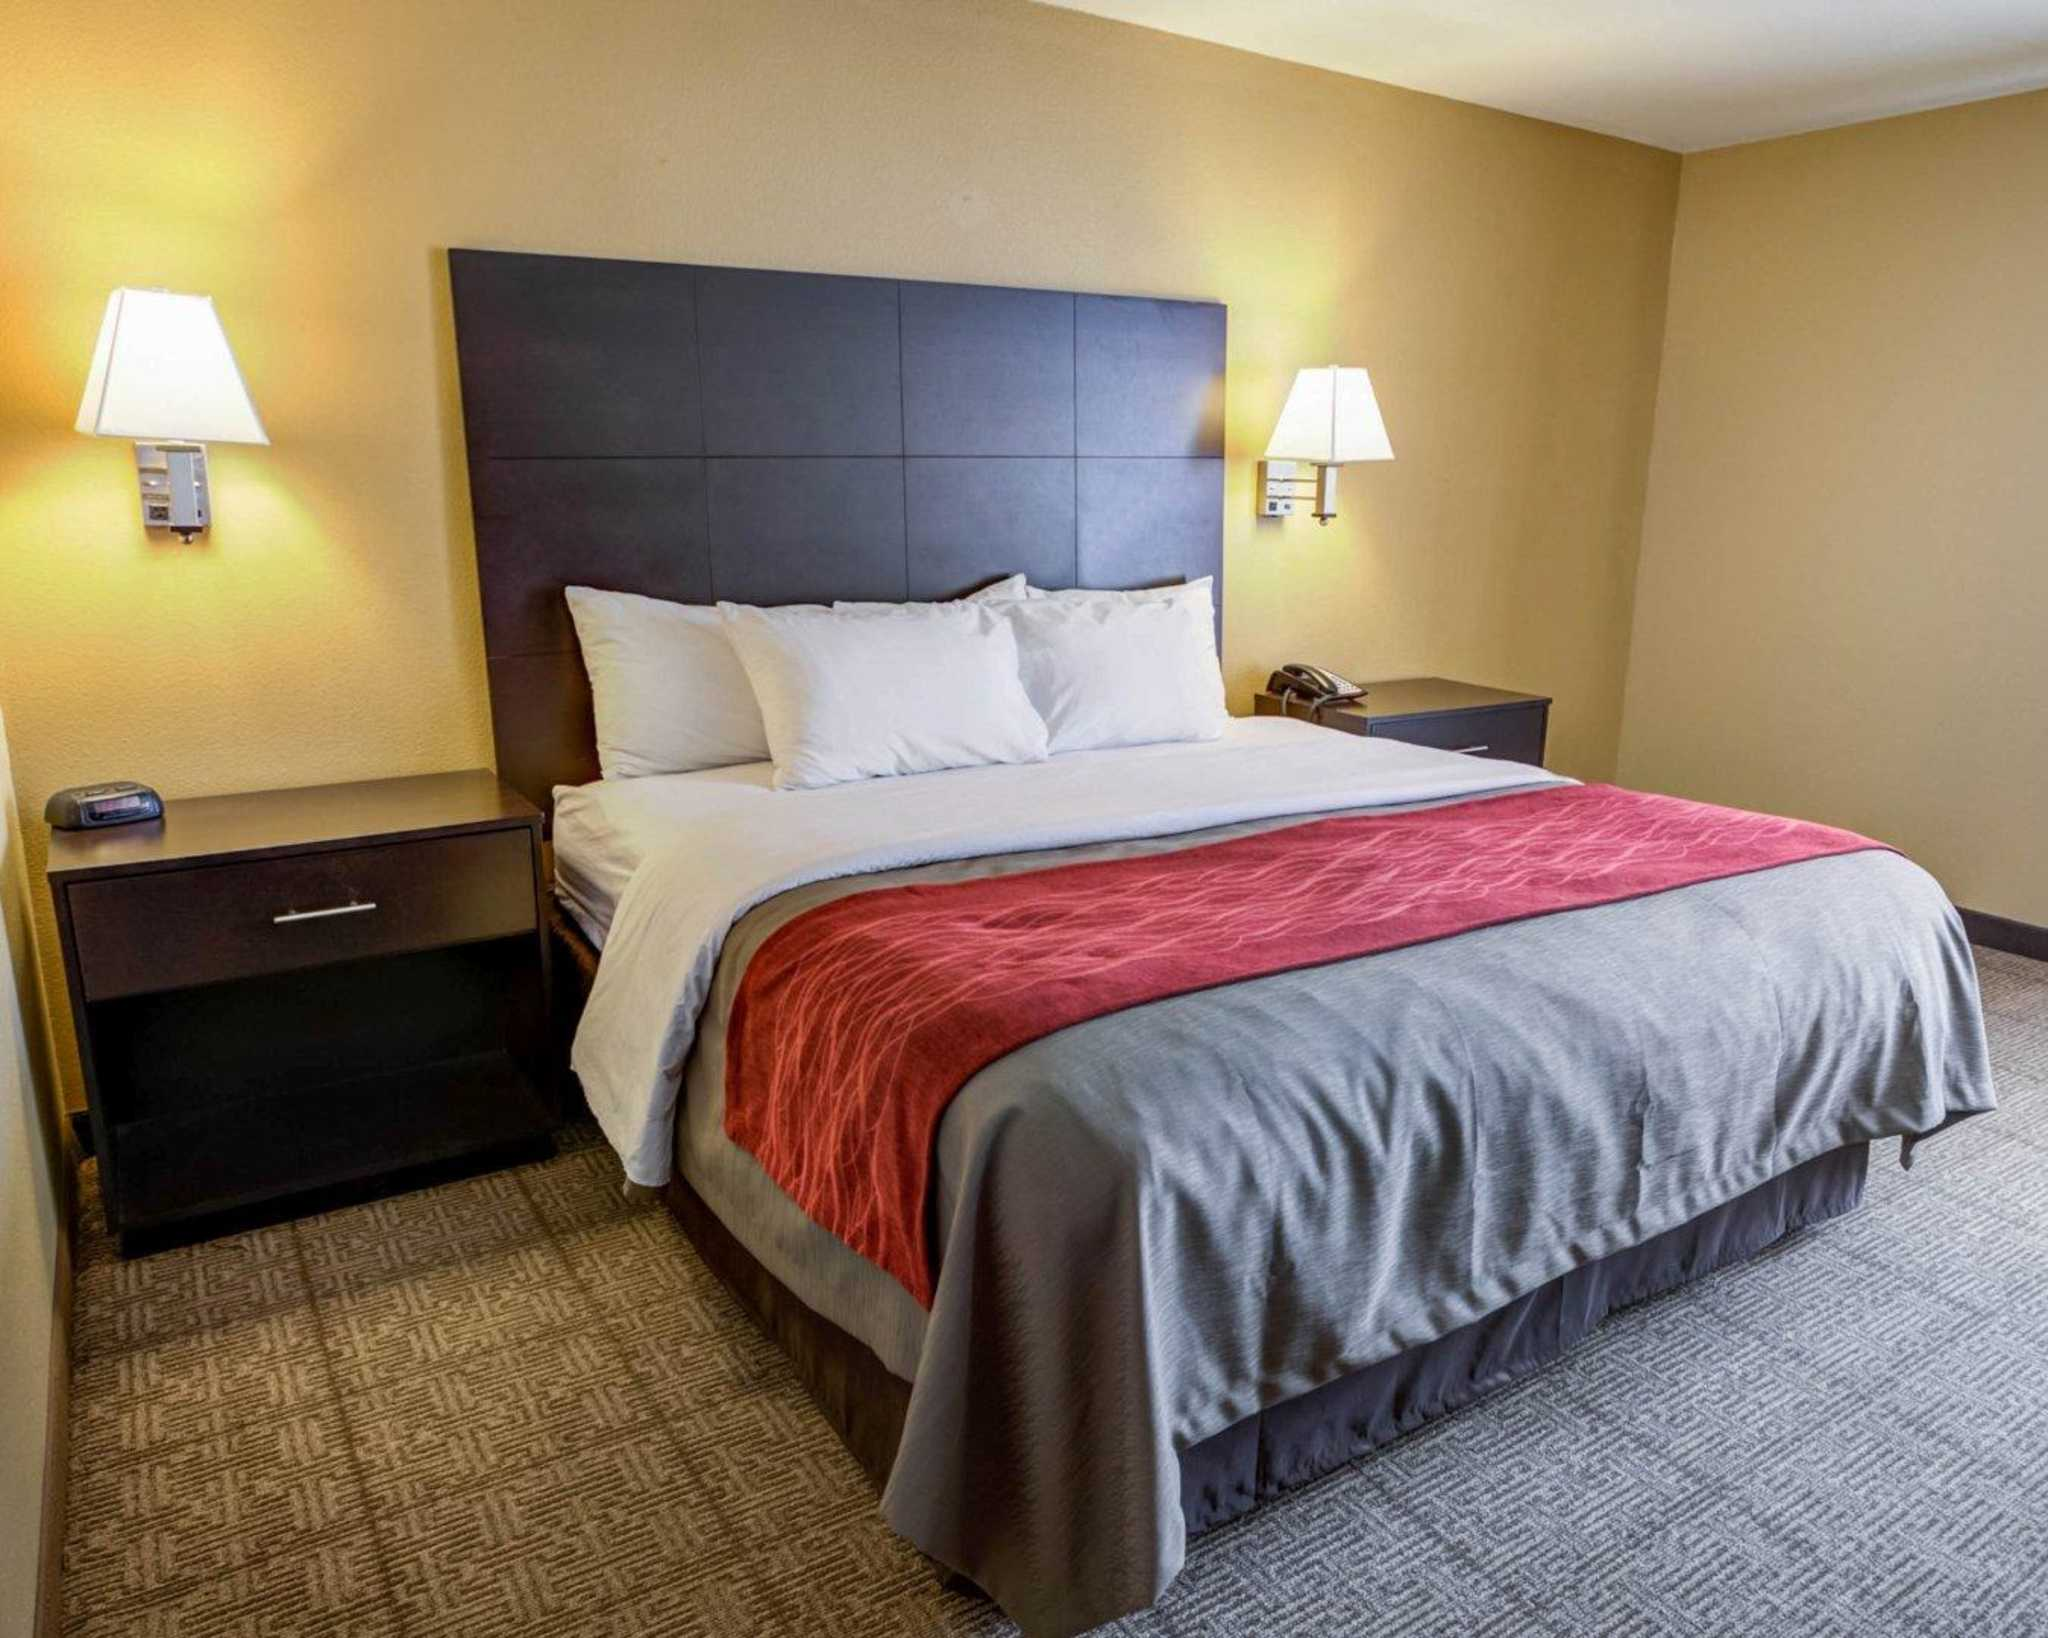 Quality Inn  U0026 Suites Lenexa Kansas City  Lenexa Kansas  Ks